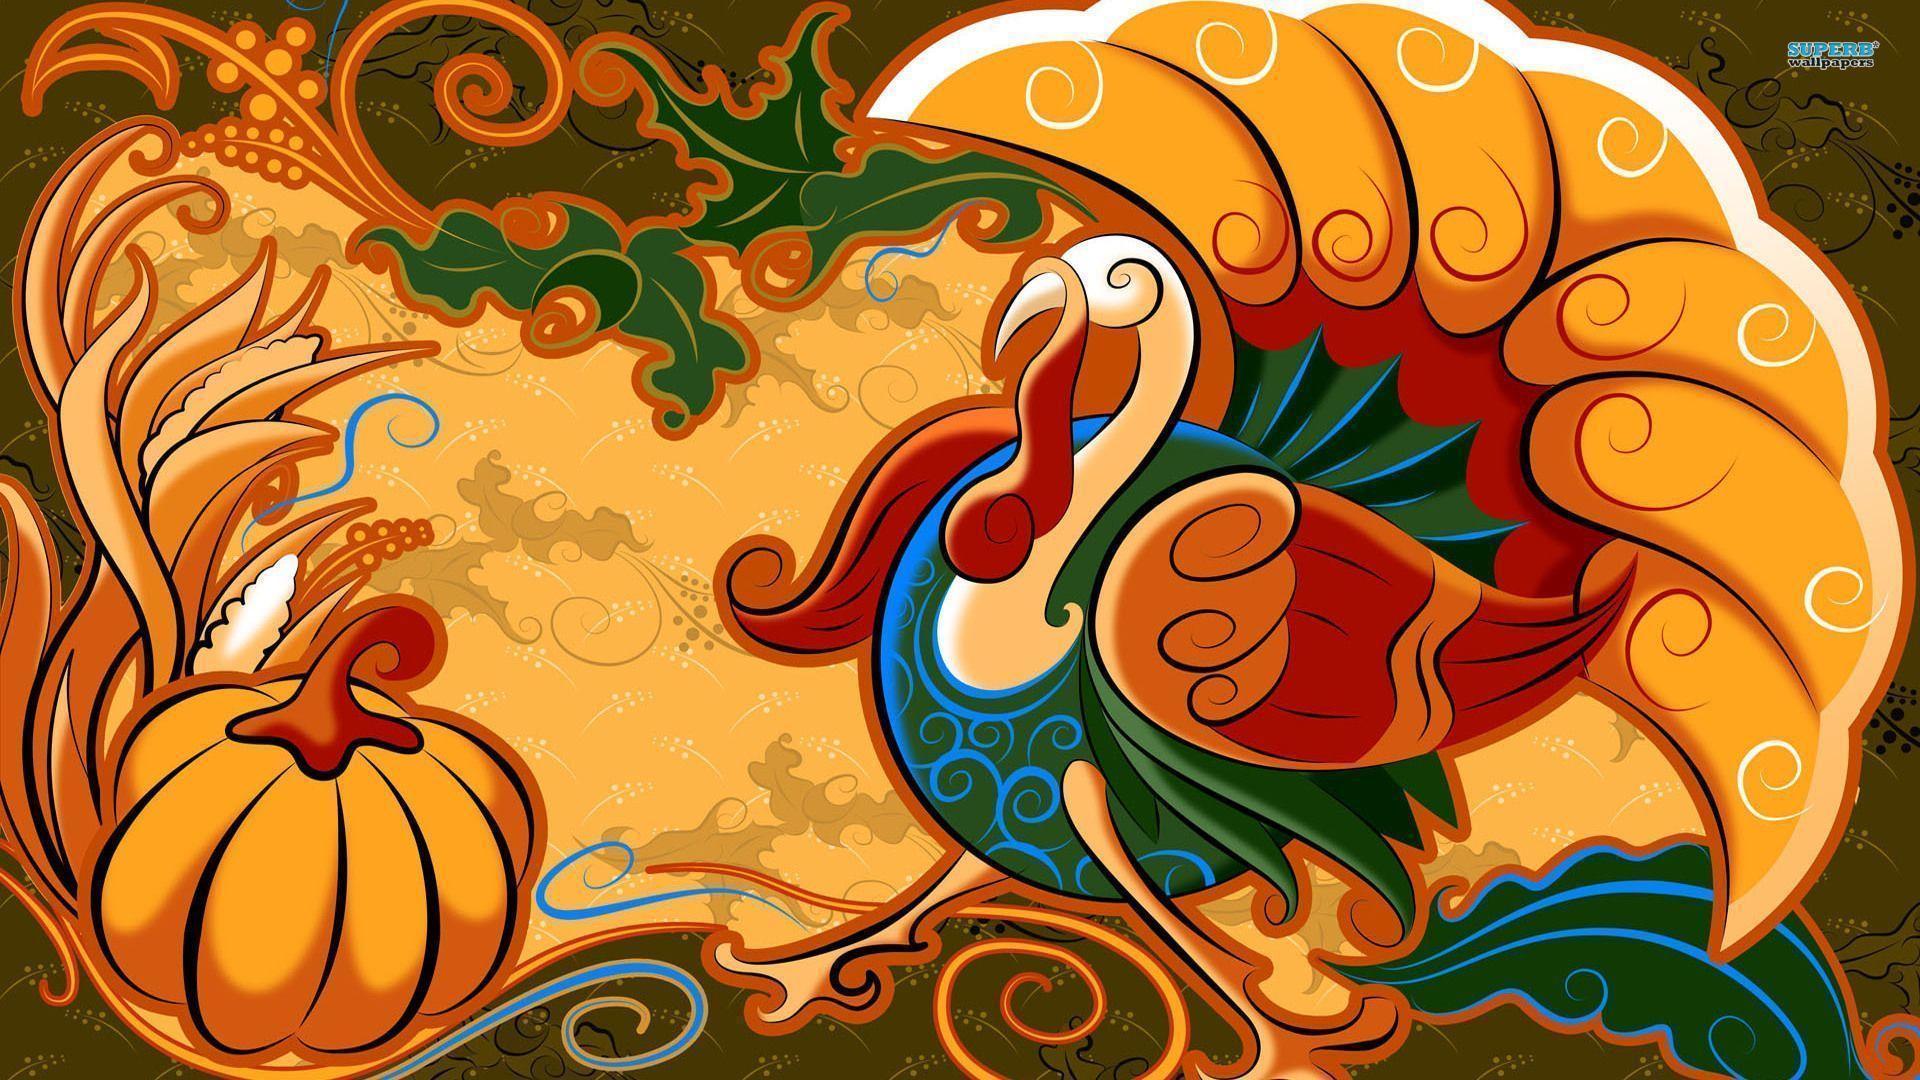 Wallpapers For > Thanksgiving Desktop Wallpaper 1920x1080